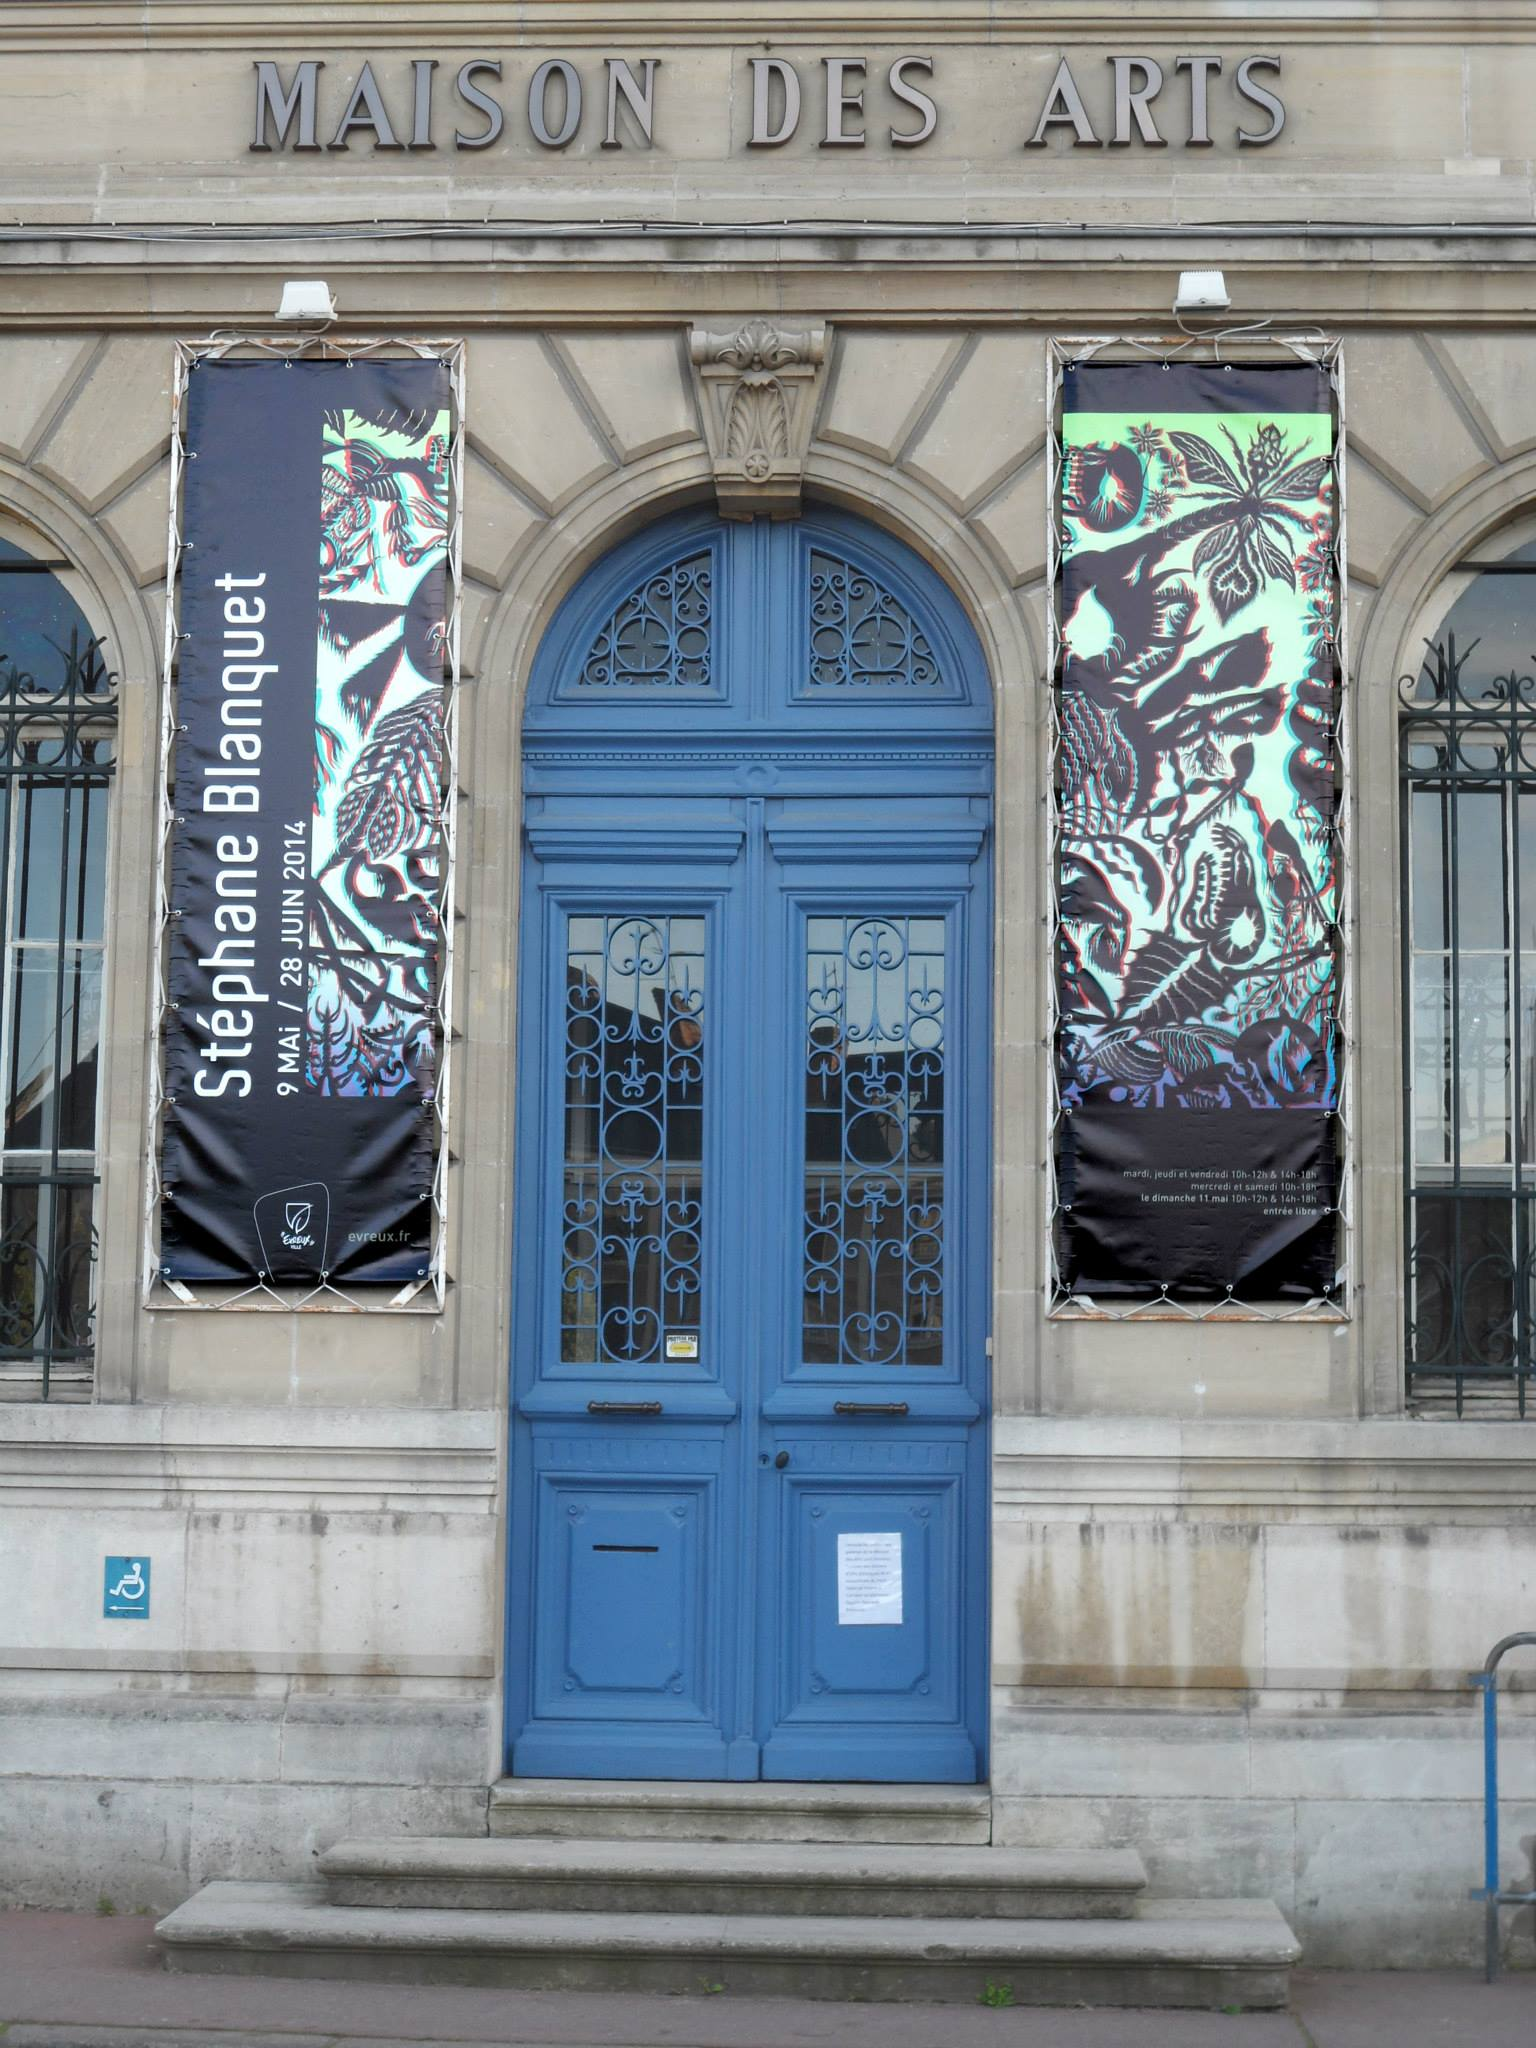 Stephane Blanquet - Evreux exhibition